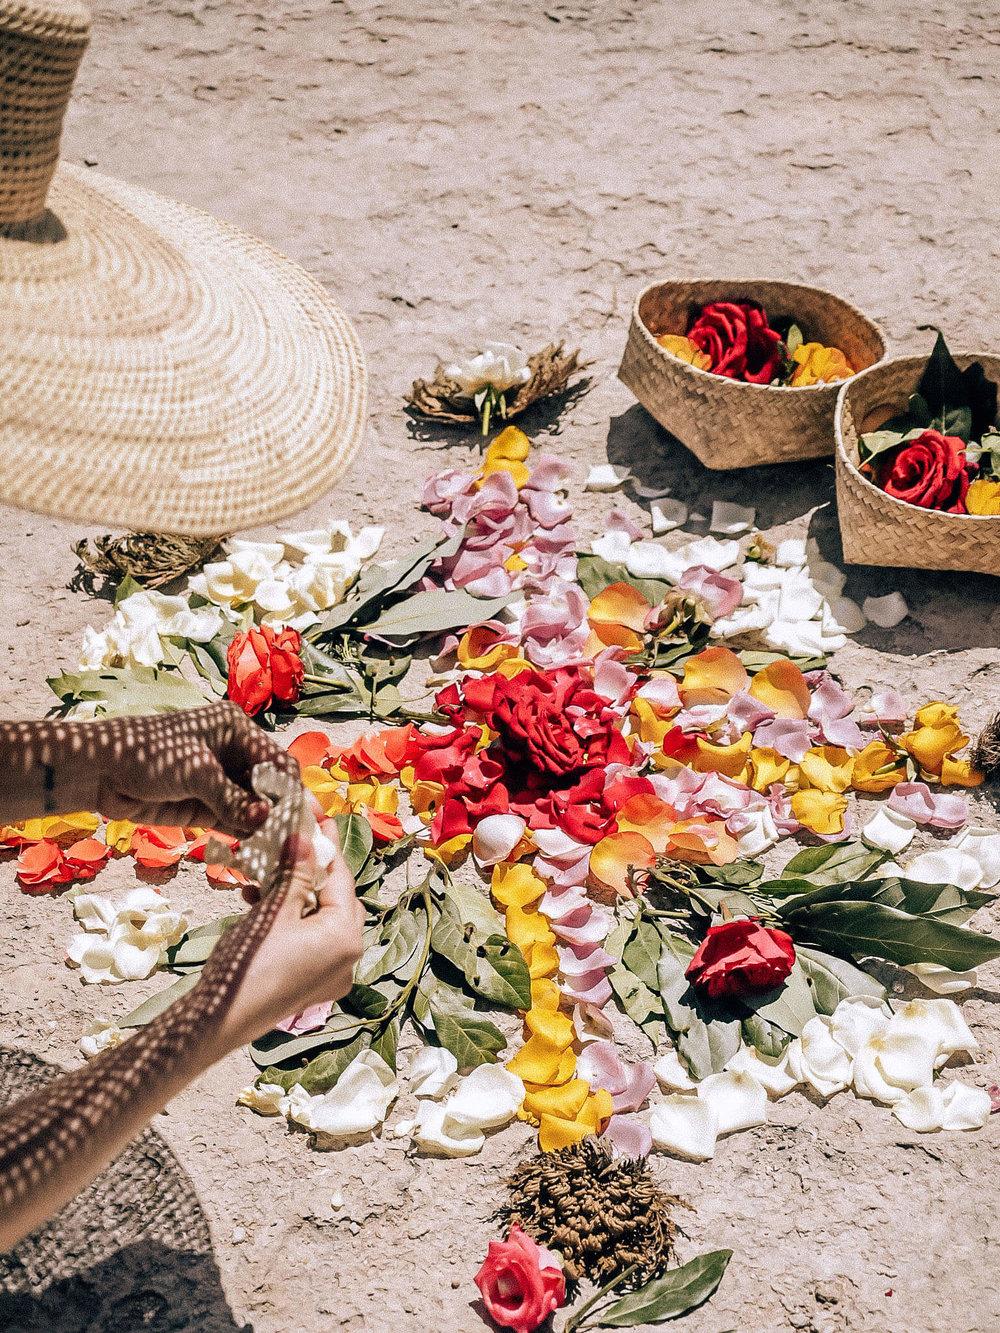 flower mandala, hierve el agua, oaxaca, mexico, shadow, chasing light